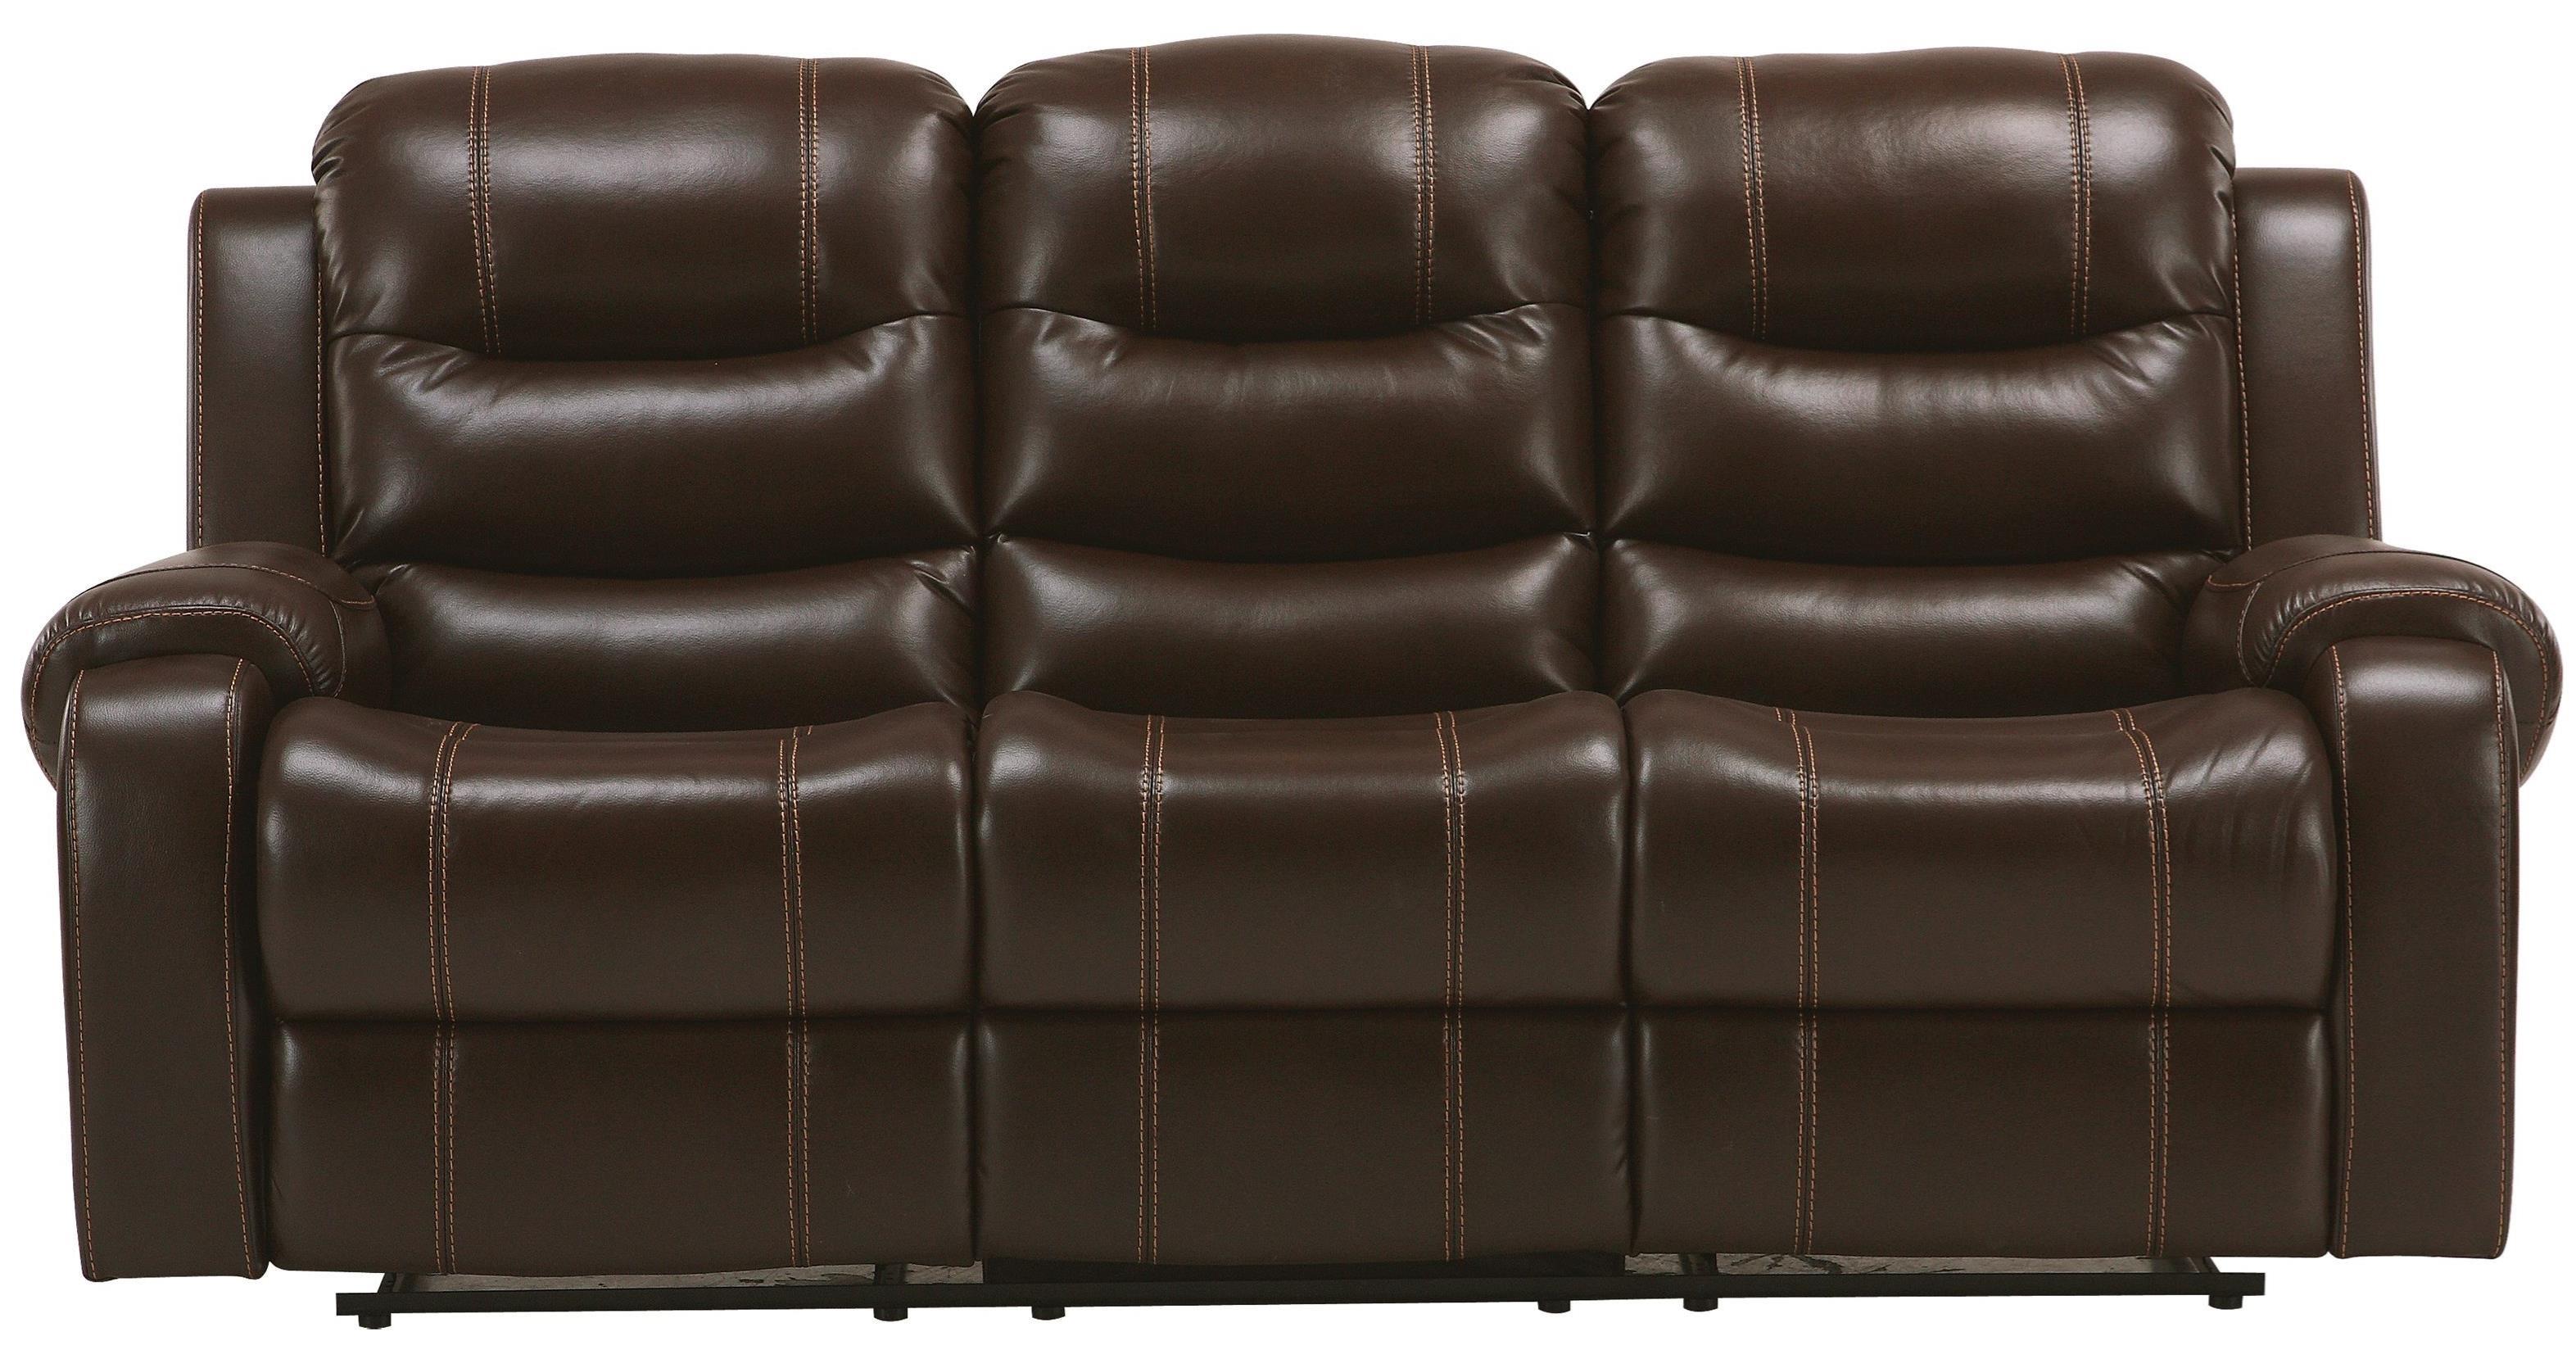 Parker Living Brahms Dual Reclining Sofa - Item Number: MBRA-832-MAH